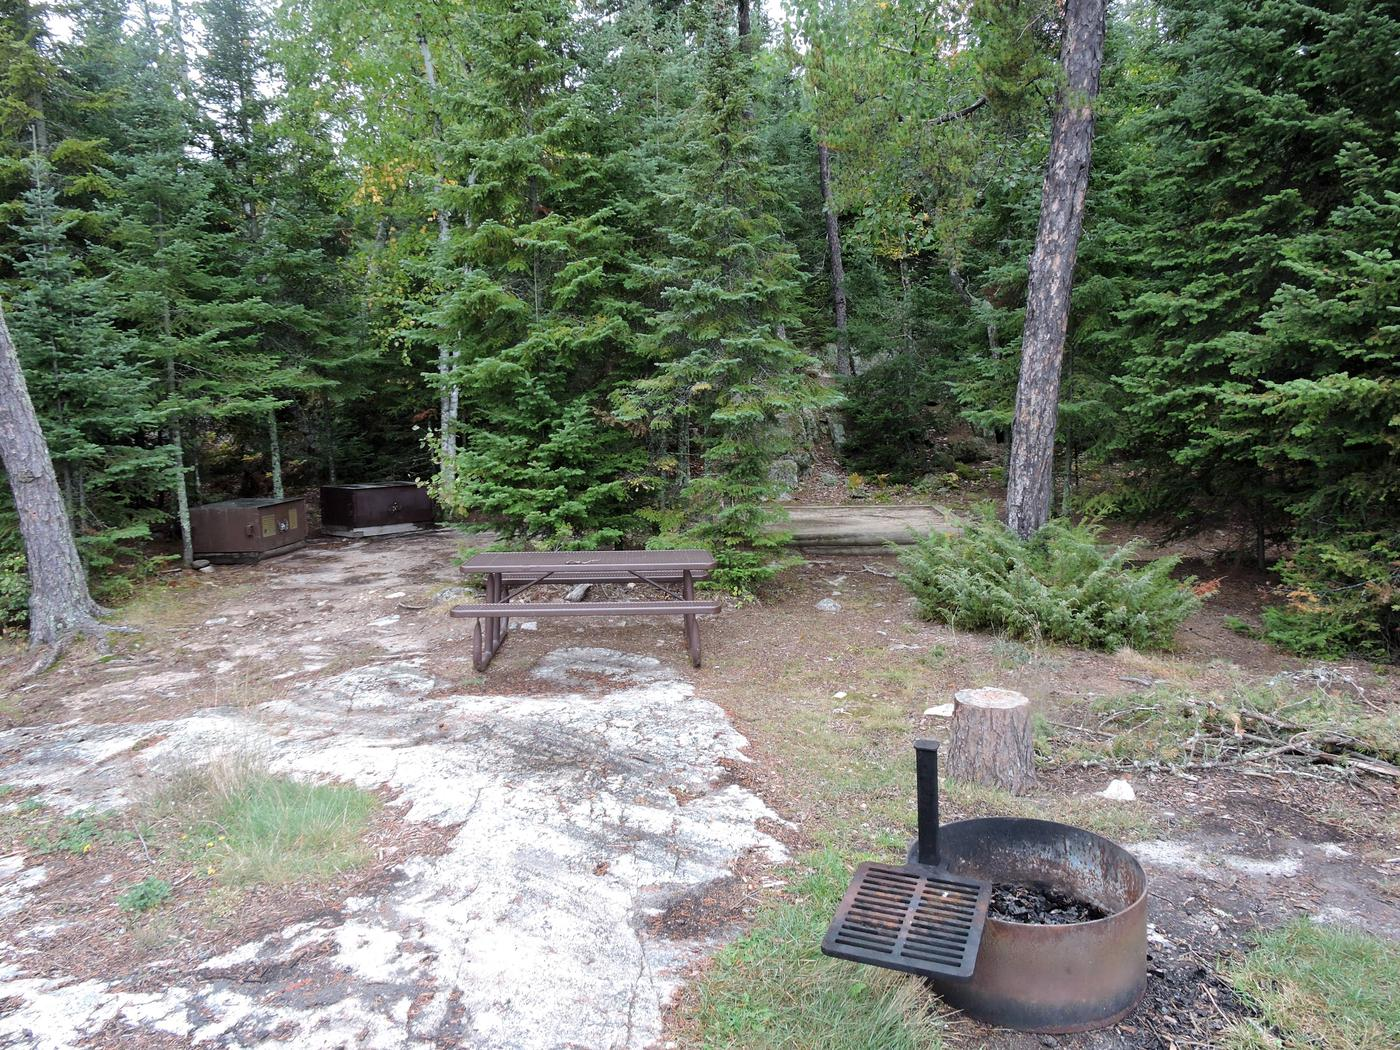 R54 - Beaver LodgeView of campsite